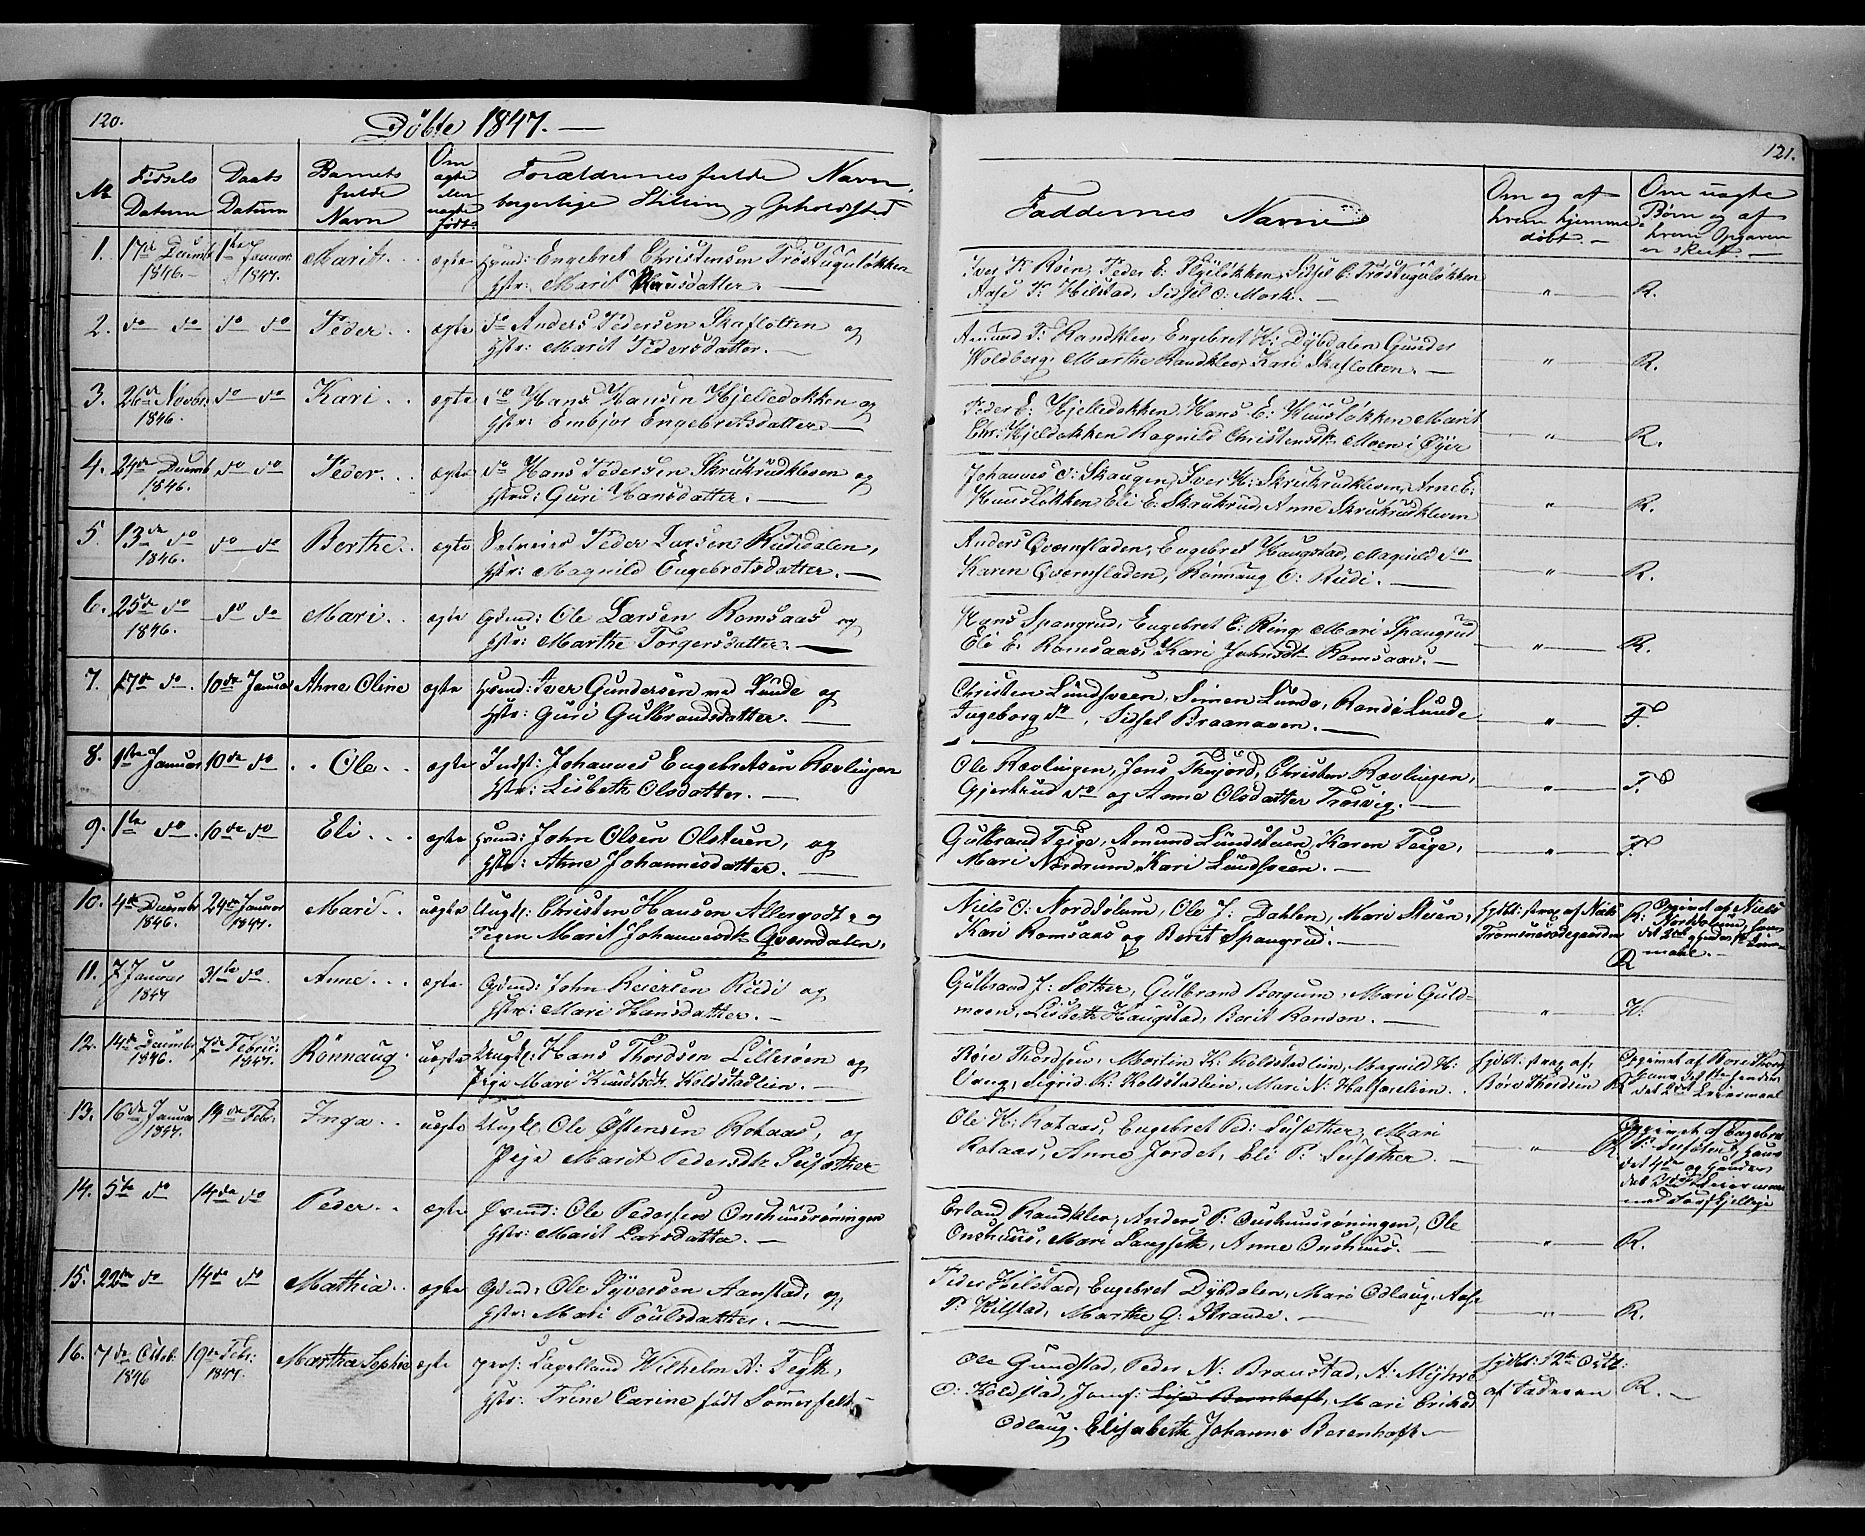 SAH, Ringebu prestekontor, Ministerialbok nr. 5, 1839-1848, s. 120-121